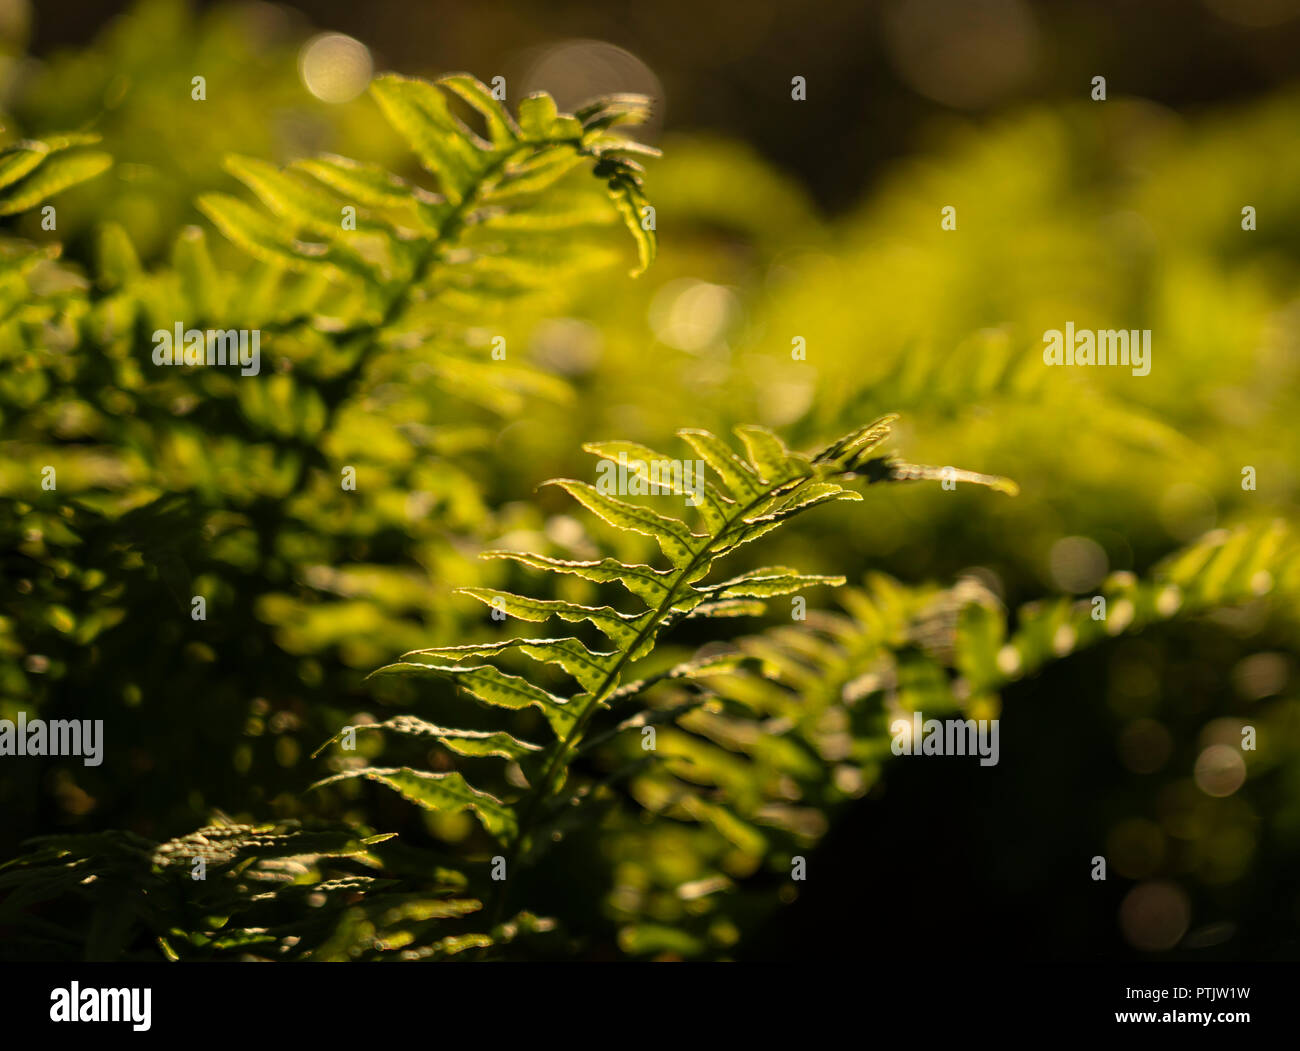 Licorice Fern (Polypodium glycyrrhiza) growingin Mount Douglas Park, Saanich near Victoria, British Columbia, Canada. Stock Photo